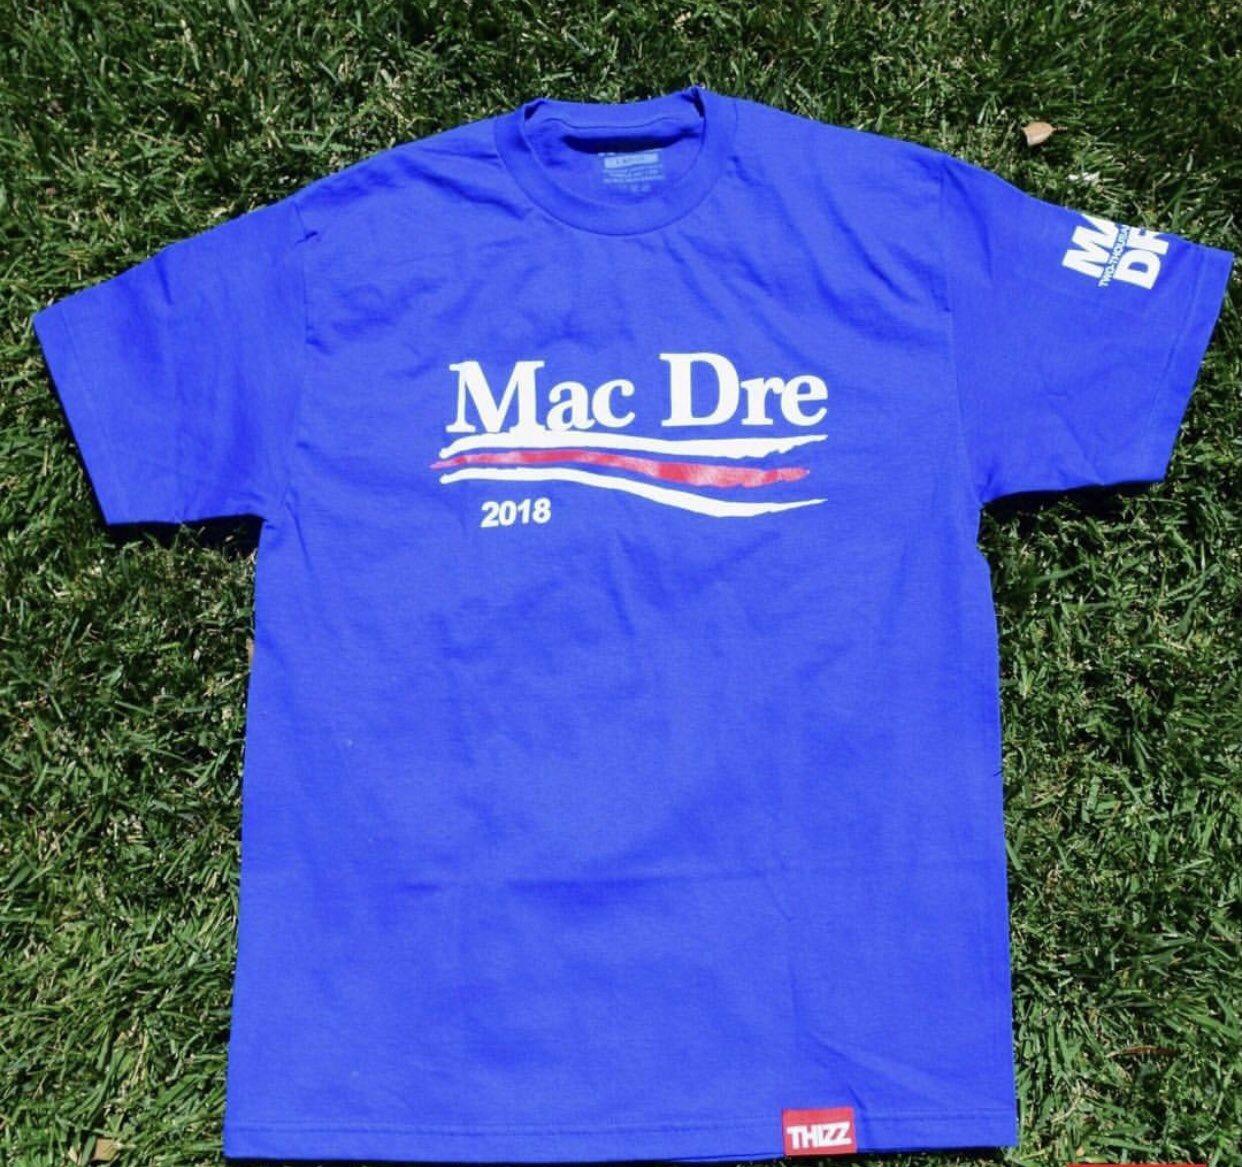 Mac Dre Day Festivals on Twitter: